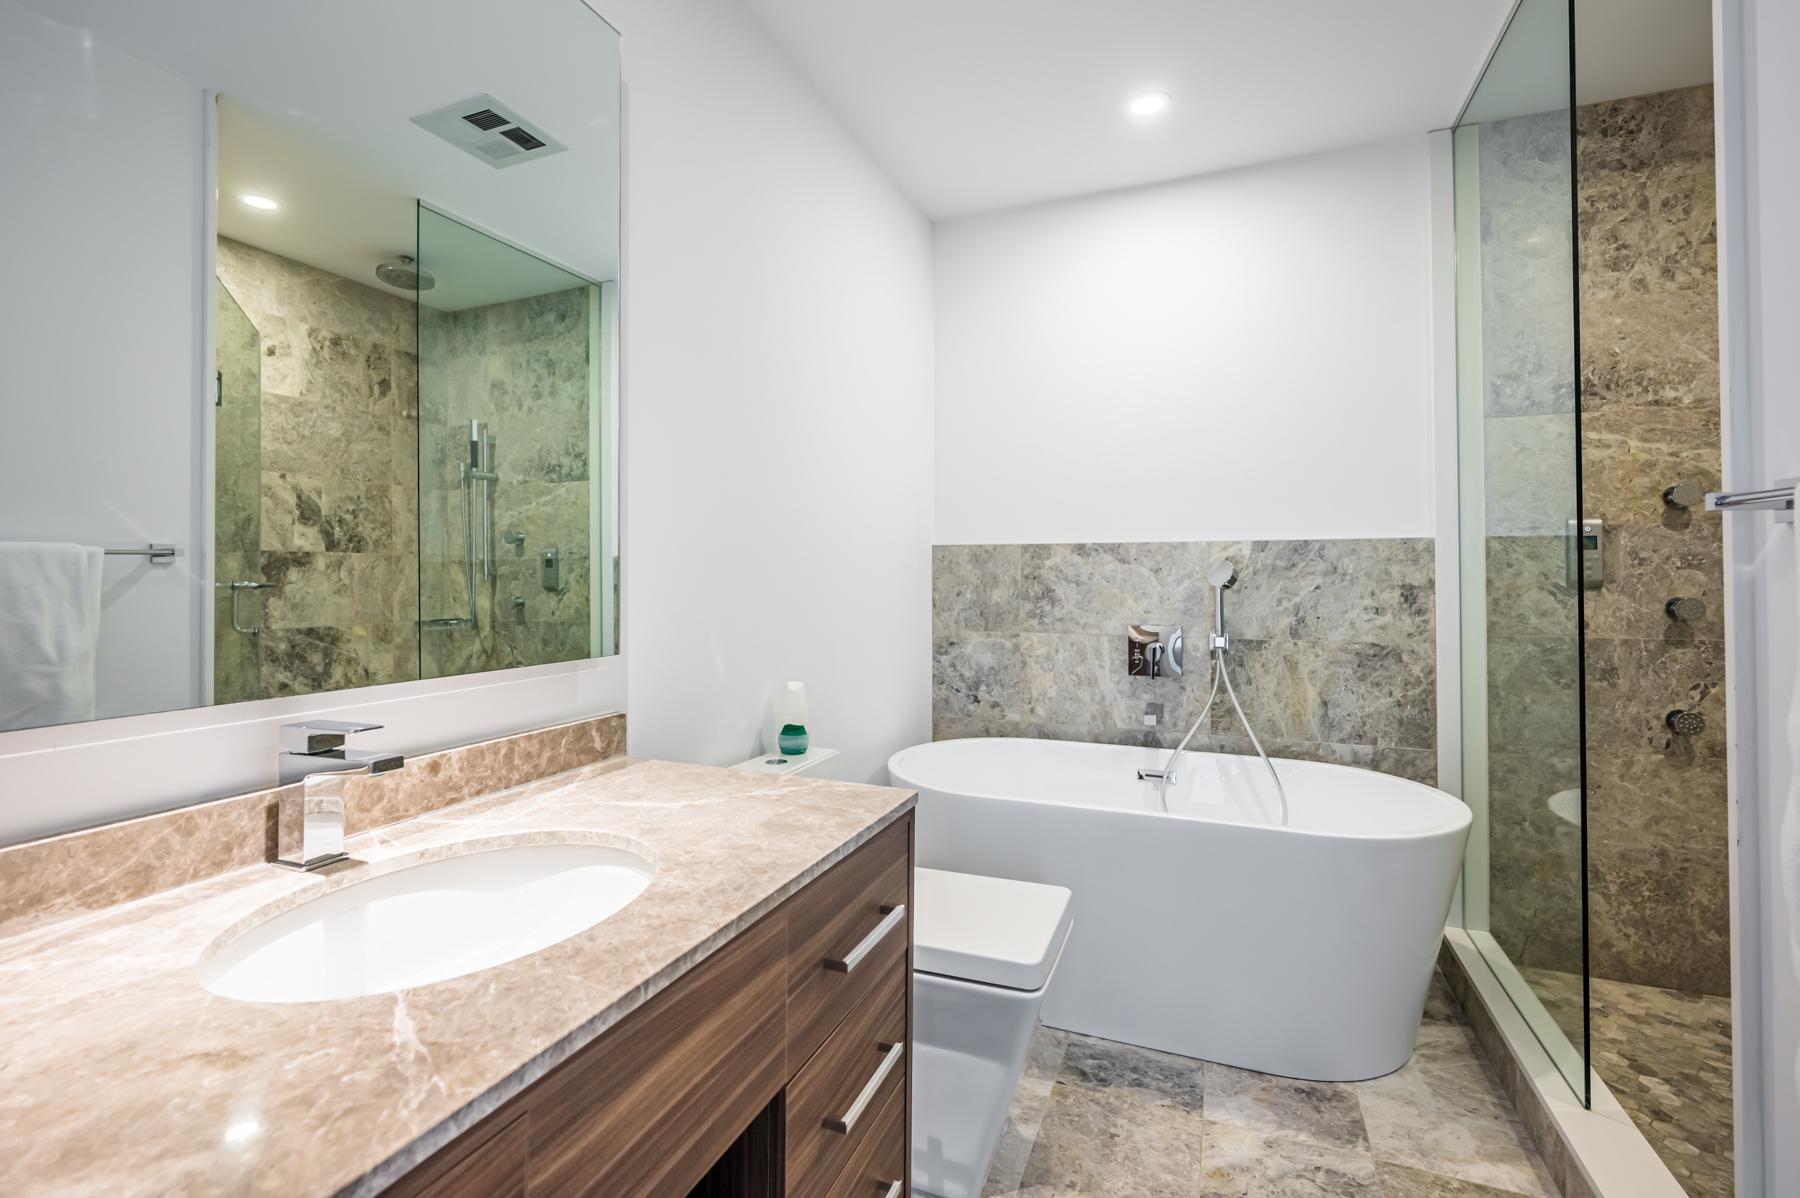 488 University Ave 4610 master bath with soaker tub.